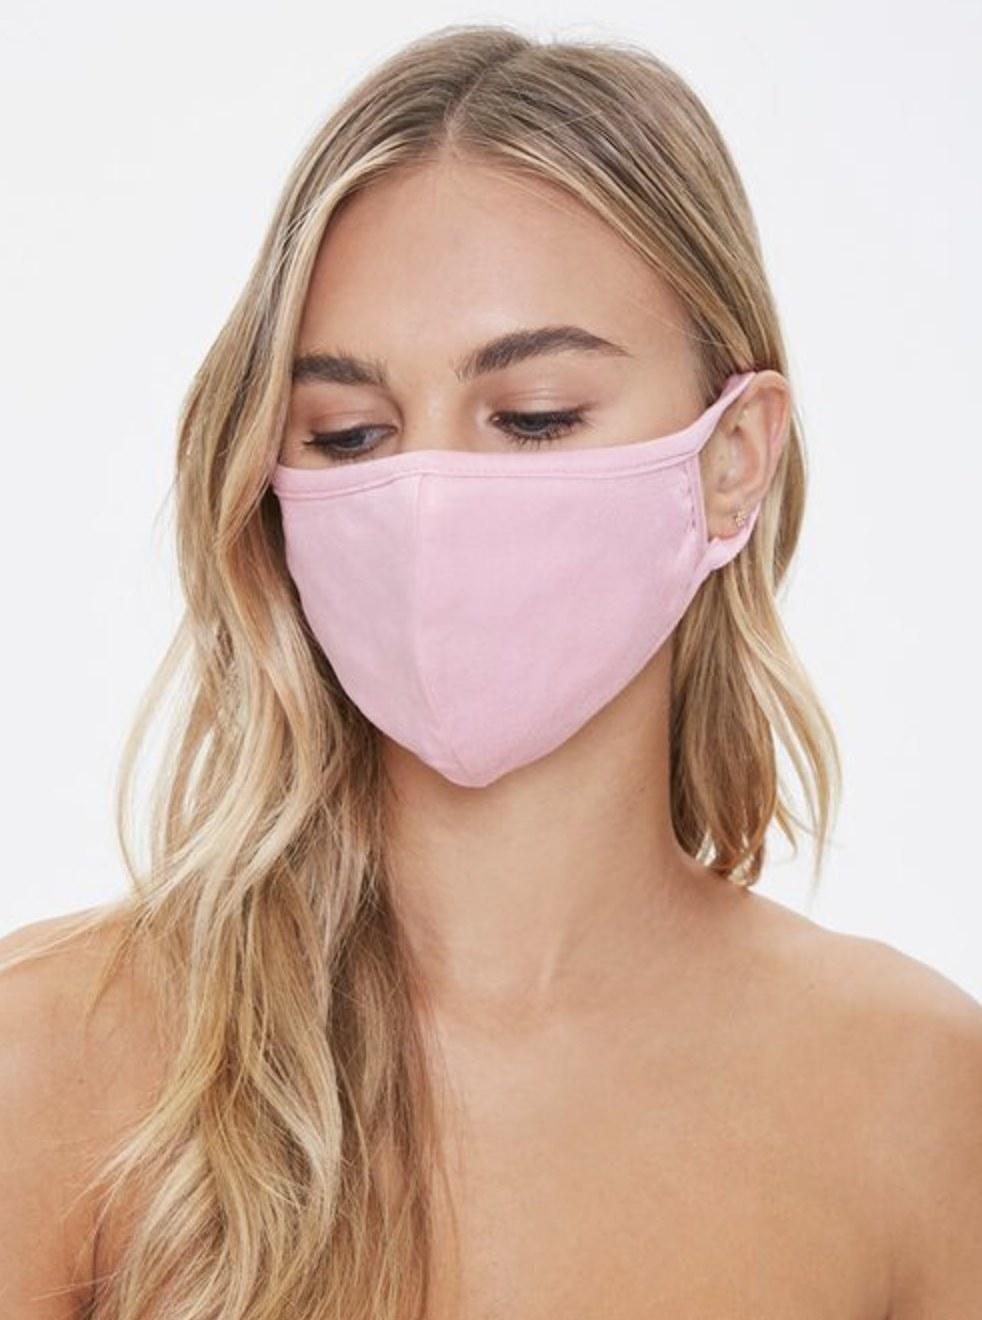 Model is wearing a light pink mask